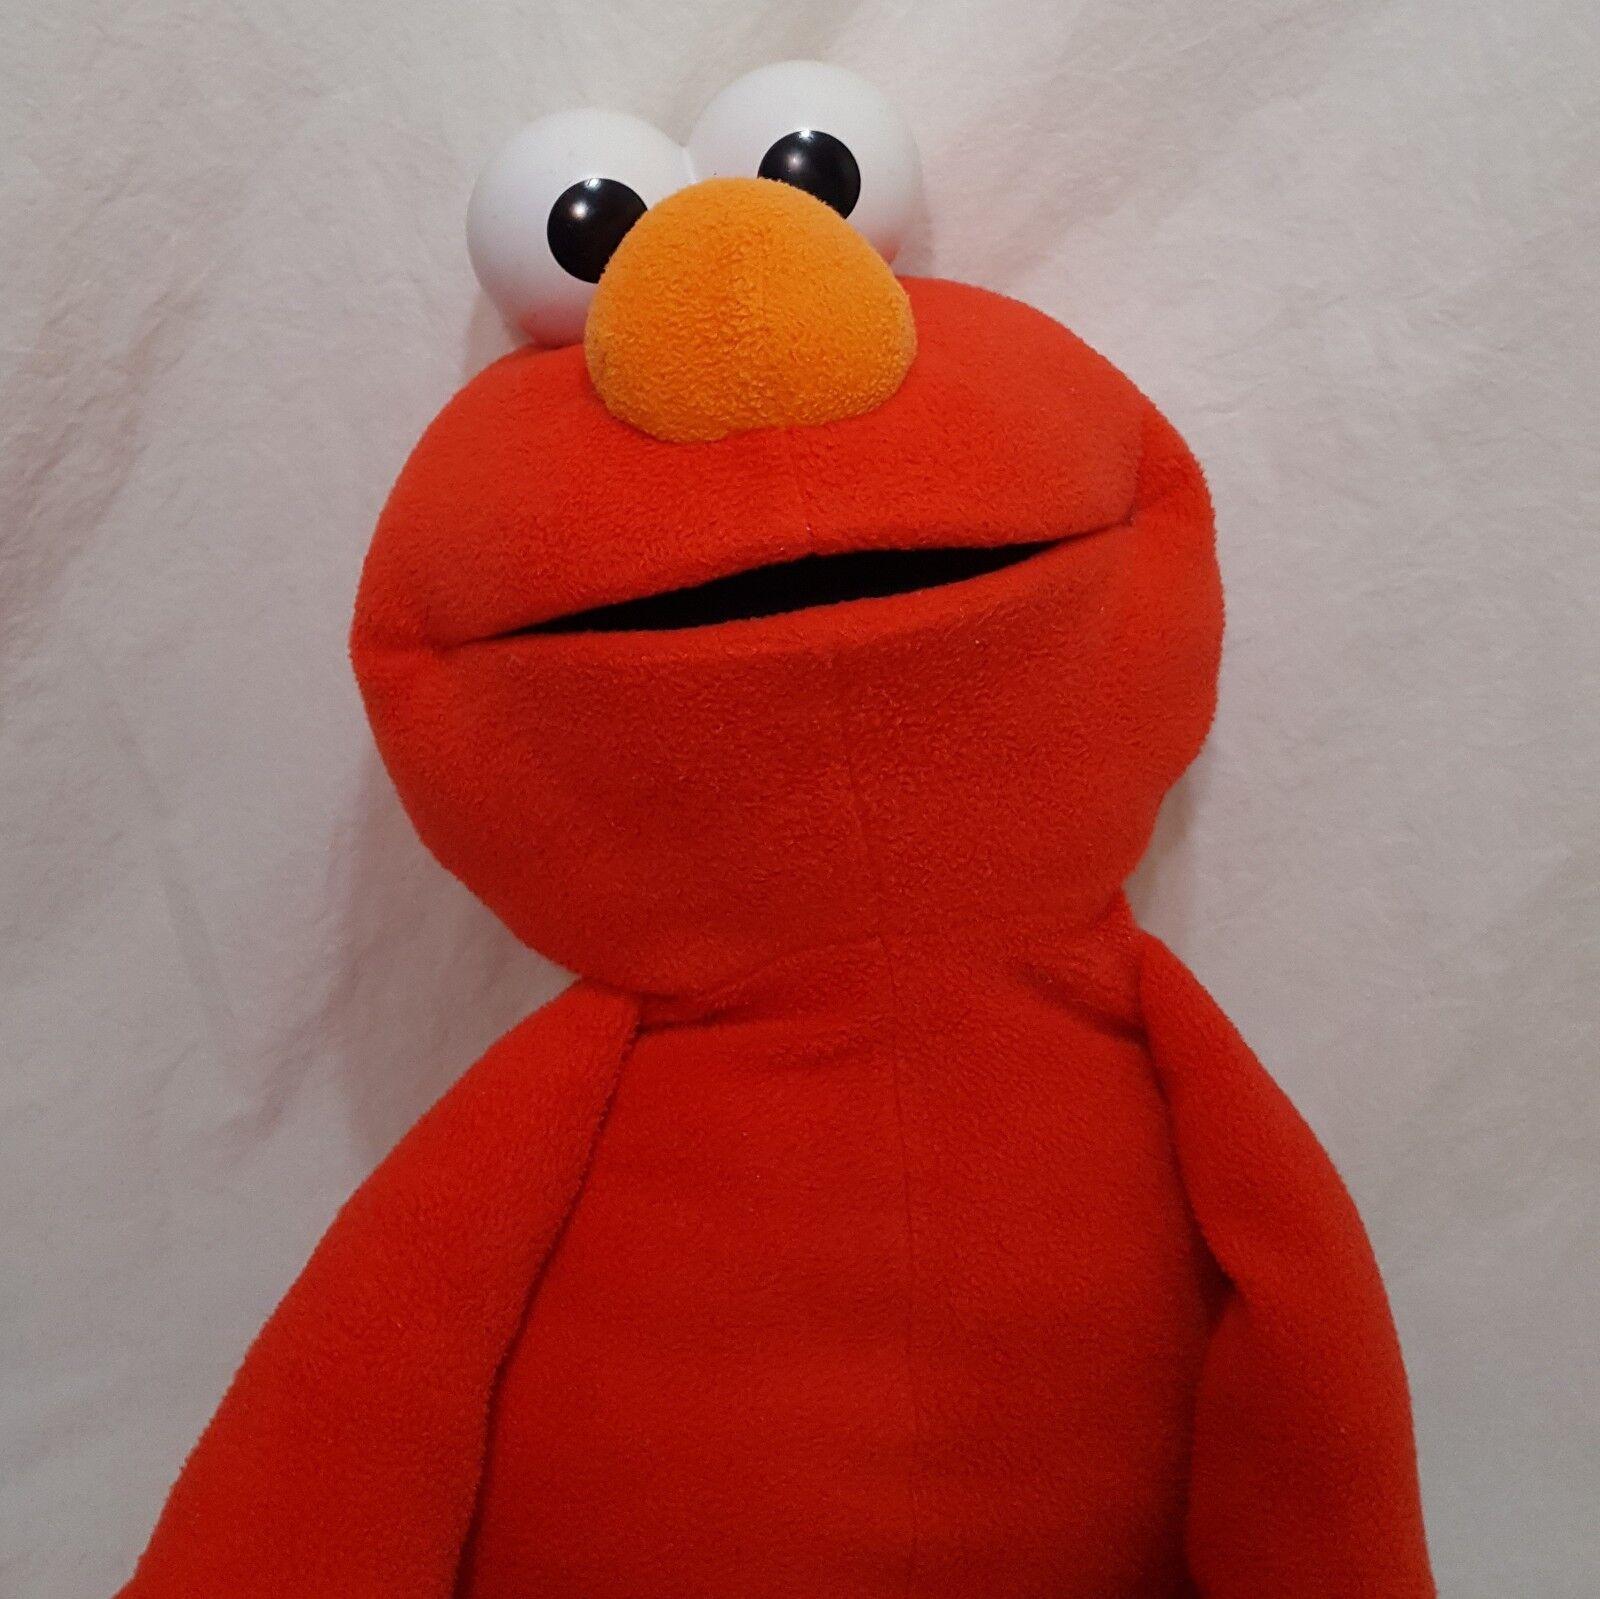 Elmo Grande De Peluche 30  Peluche Juguete Sesame Street Fisher Price 2002